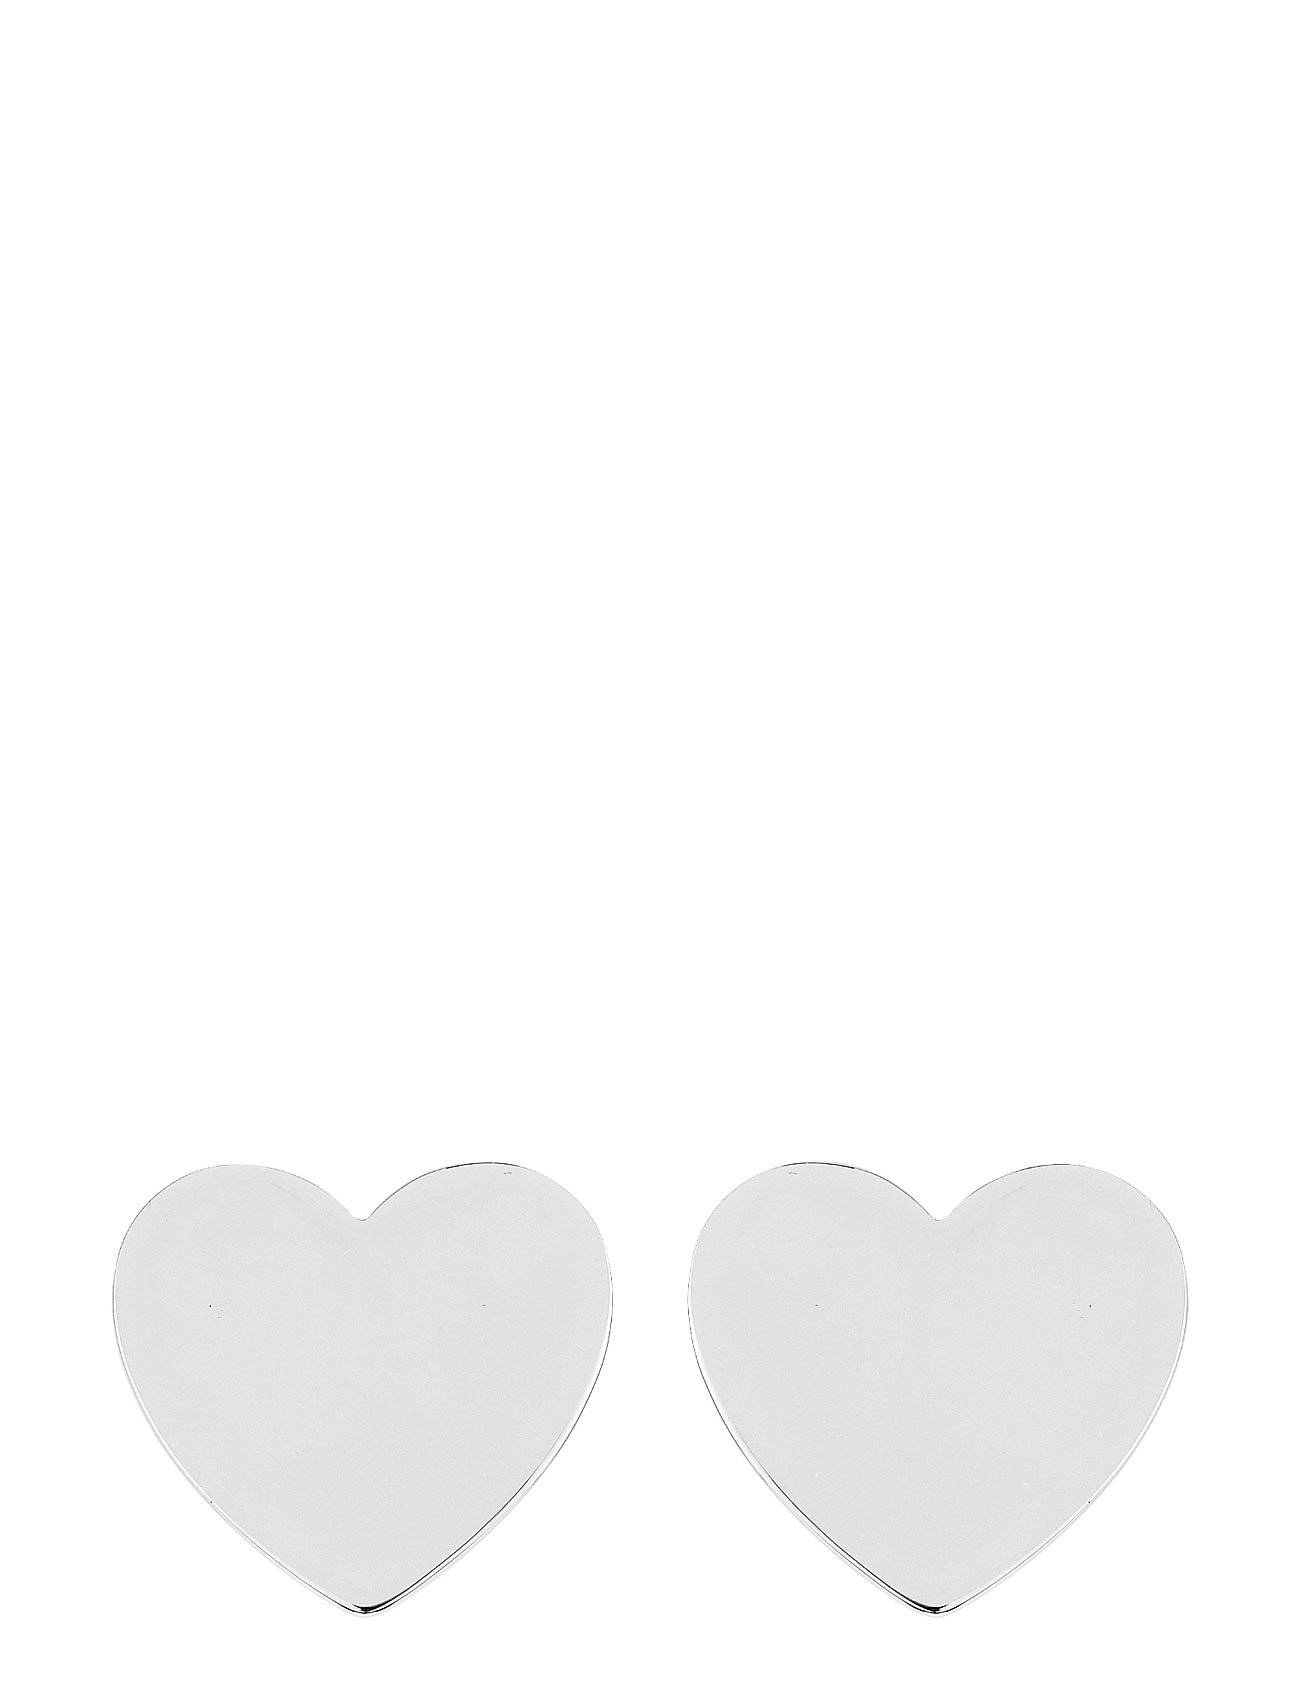 SOPHIE by SOPHIE Heart Mini Studs Accessories Jewellery Earrings Studs Hopea SOPHIE By SOPHIE